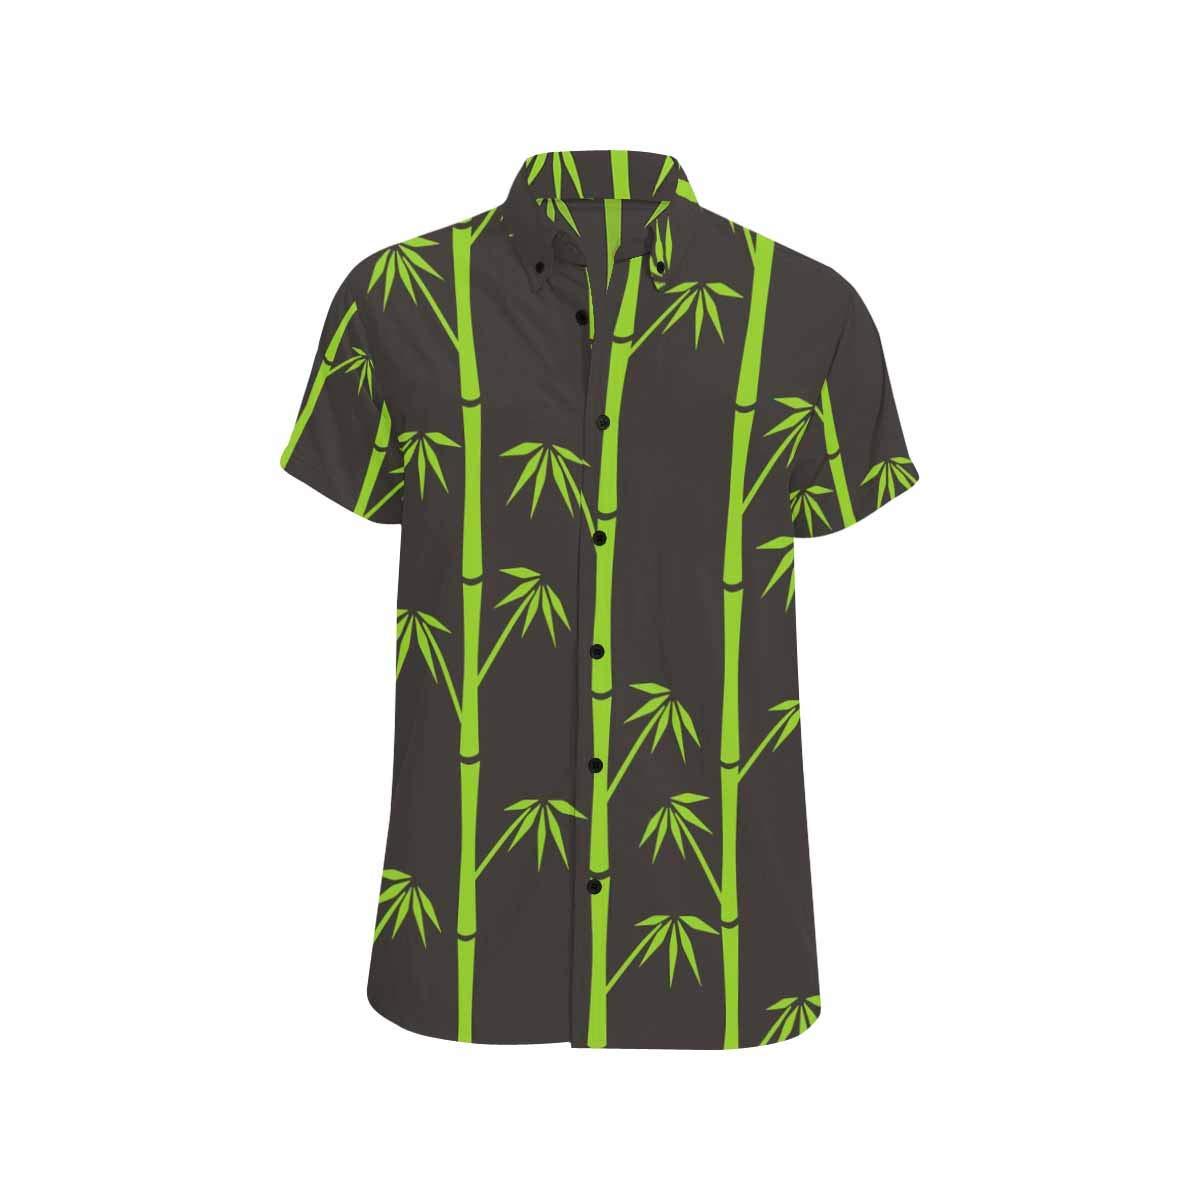 InterestPrint Mens Botton Up Shirt Patricks Day with Shamrock T Shirts for Regular Fit